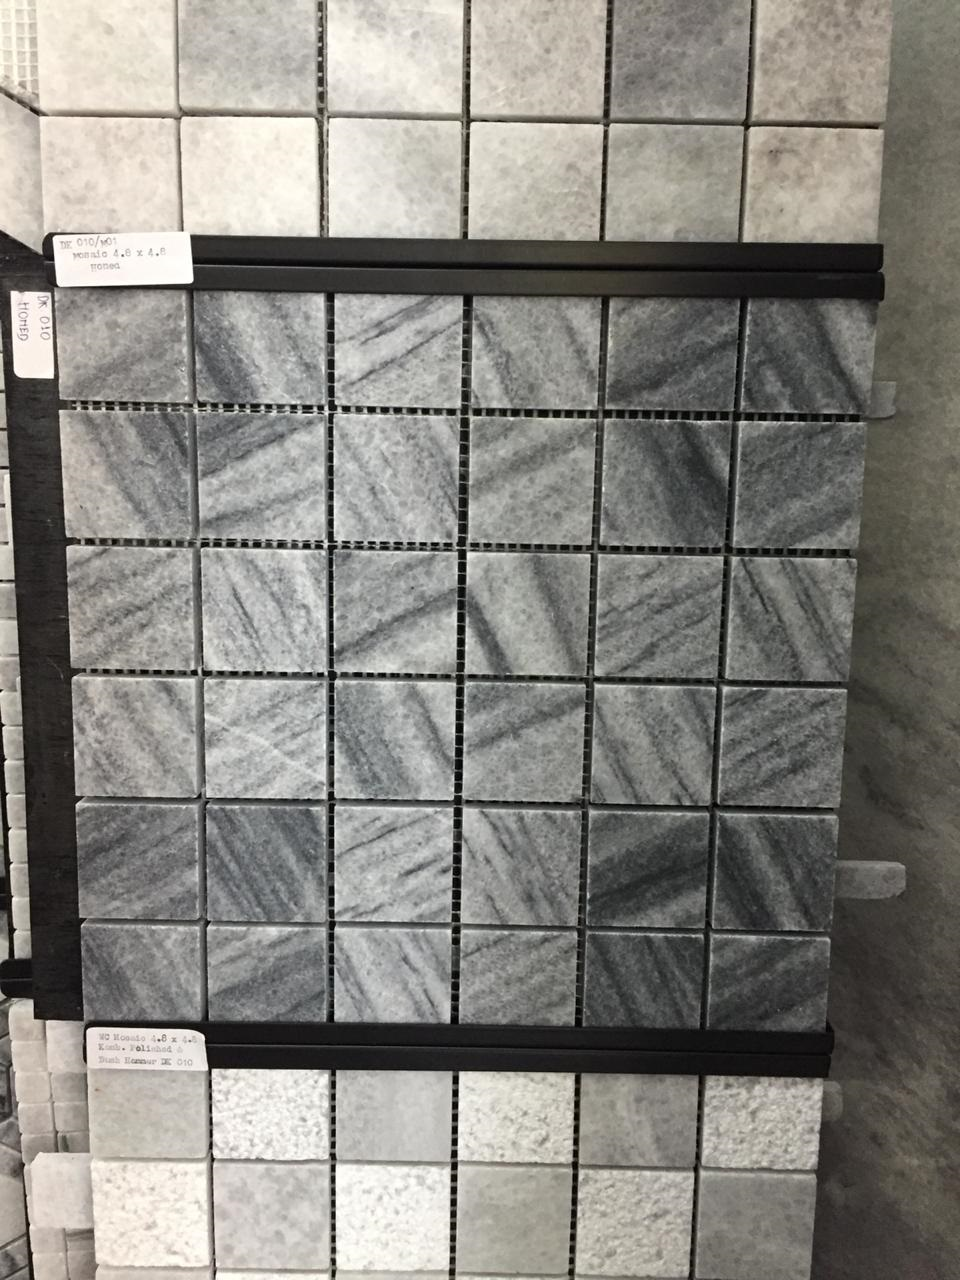 Bali White Marble Square Pattern Mosaic Tile